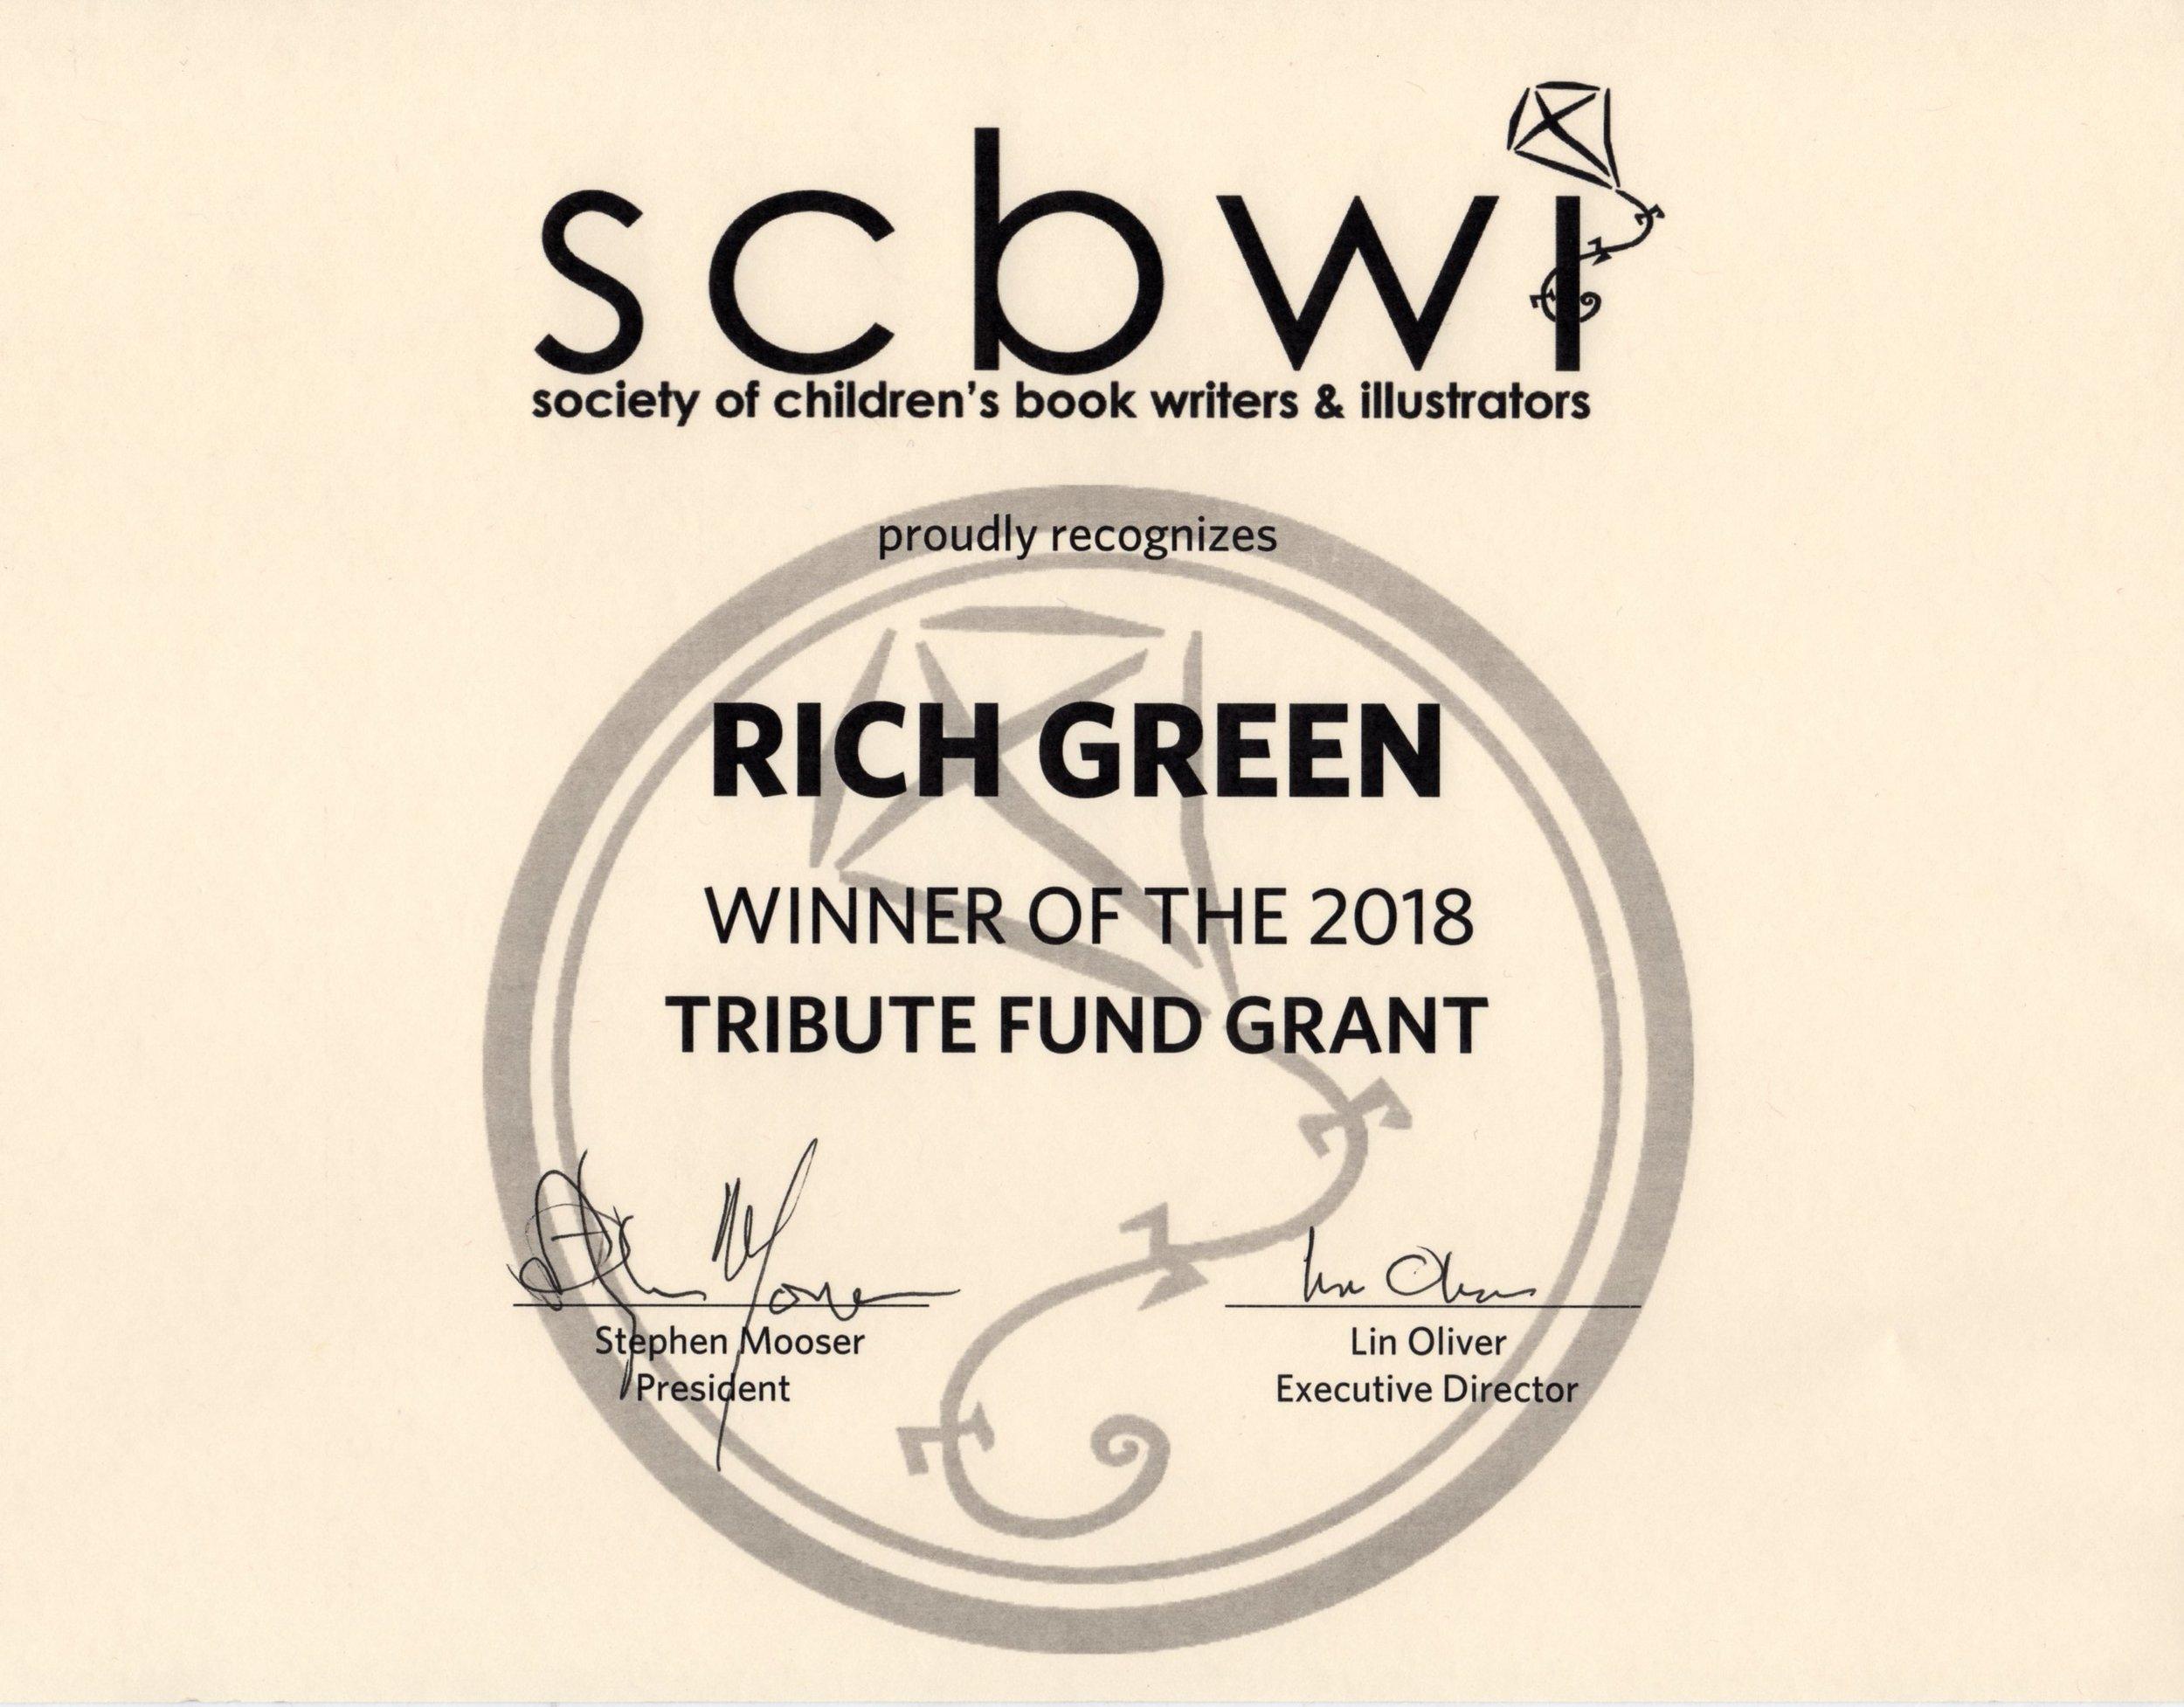 SCBWI Tribute Fund Grant001.jpg